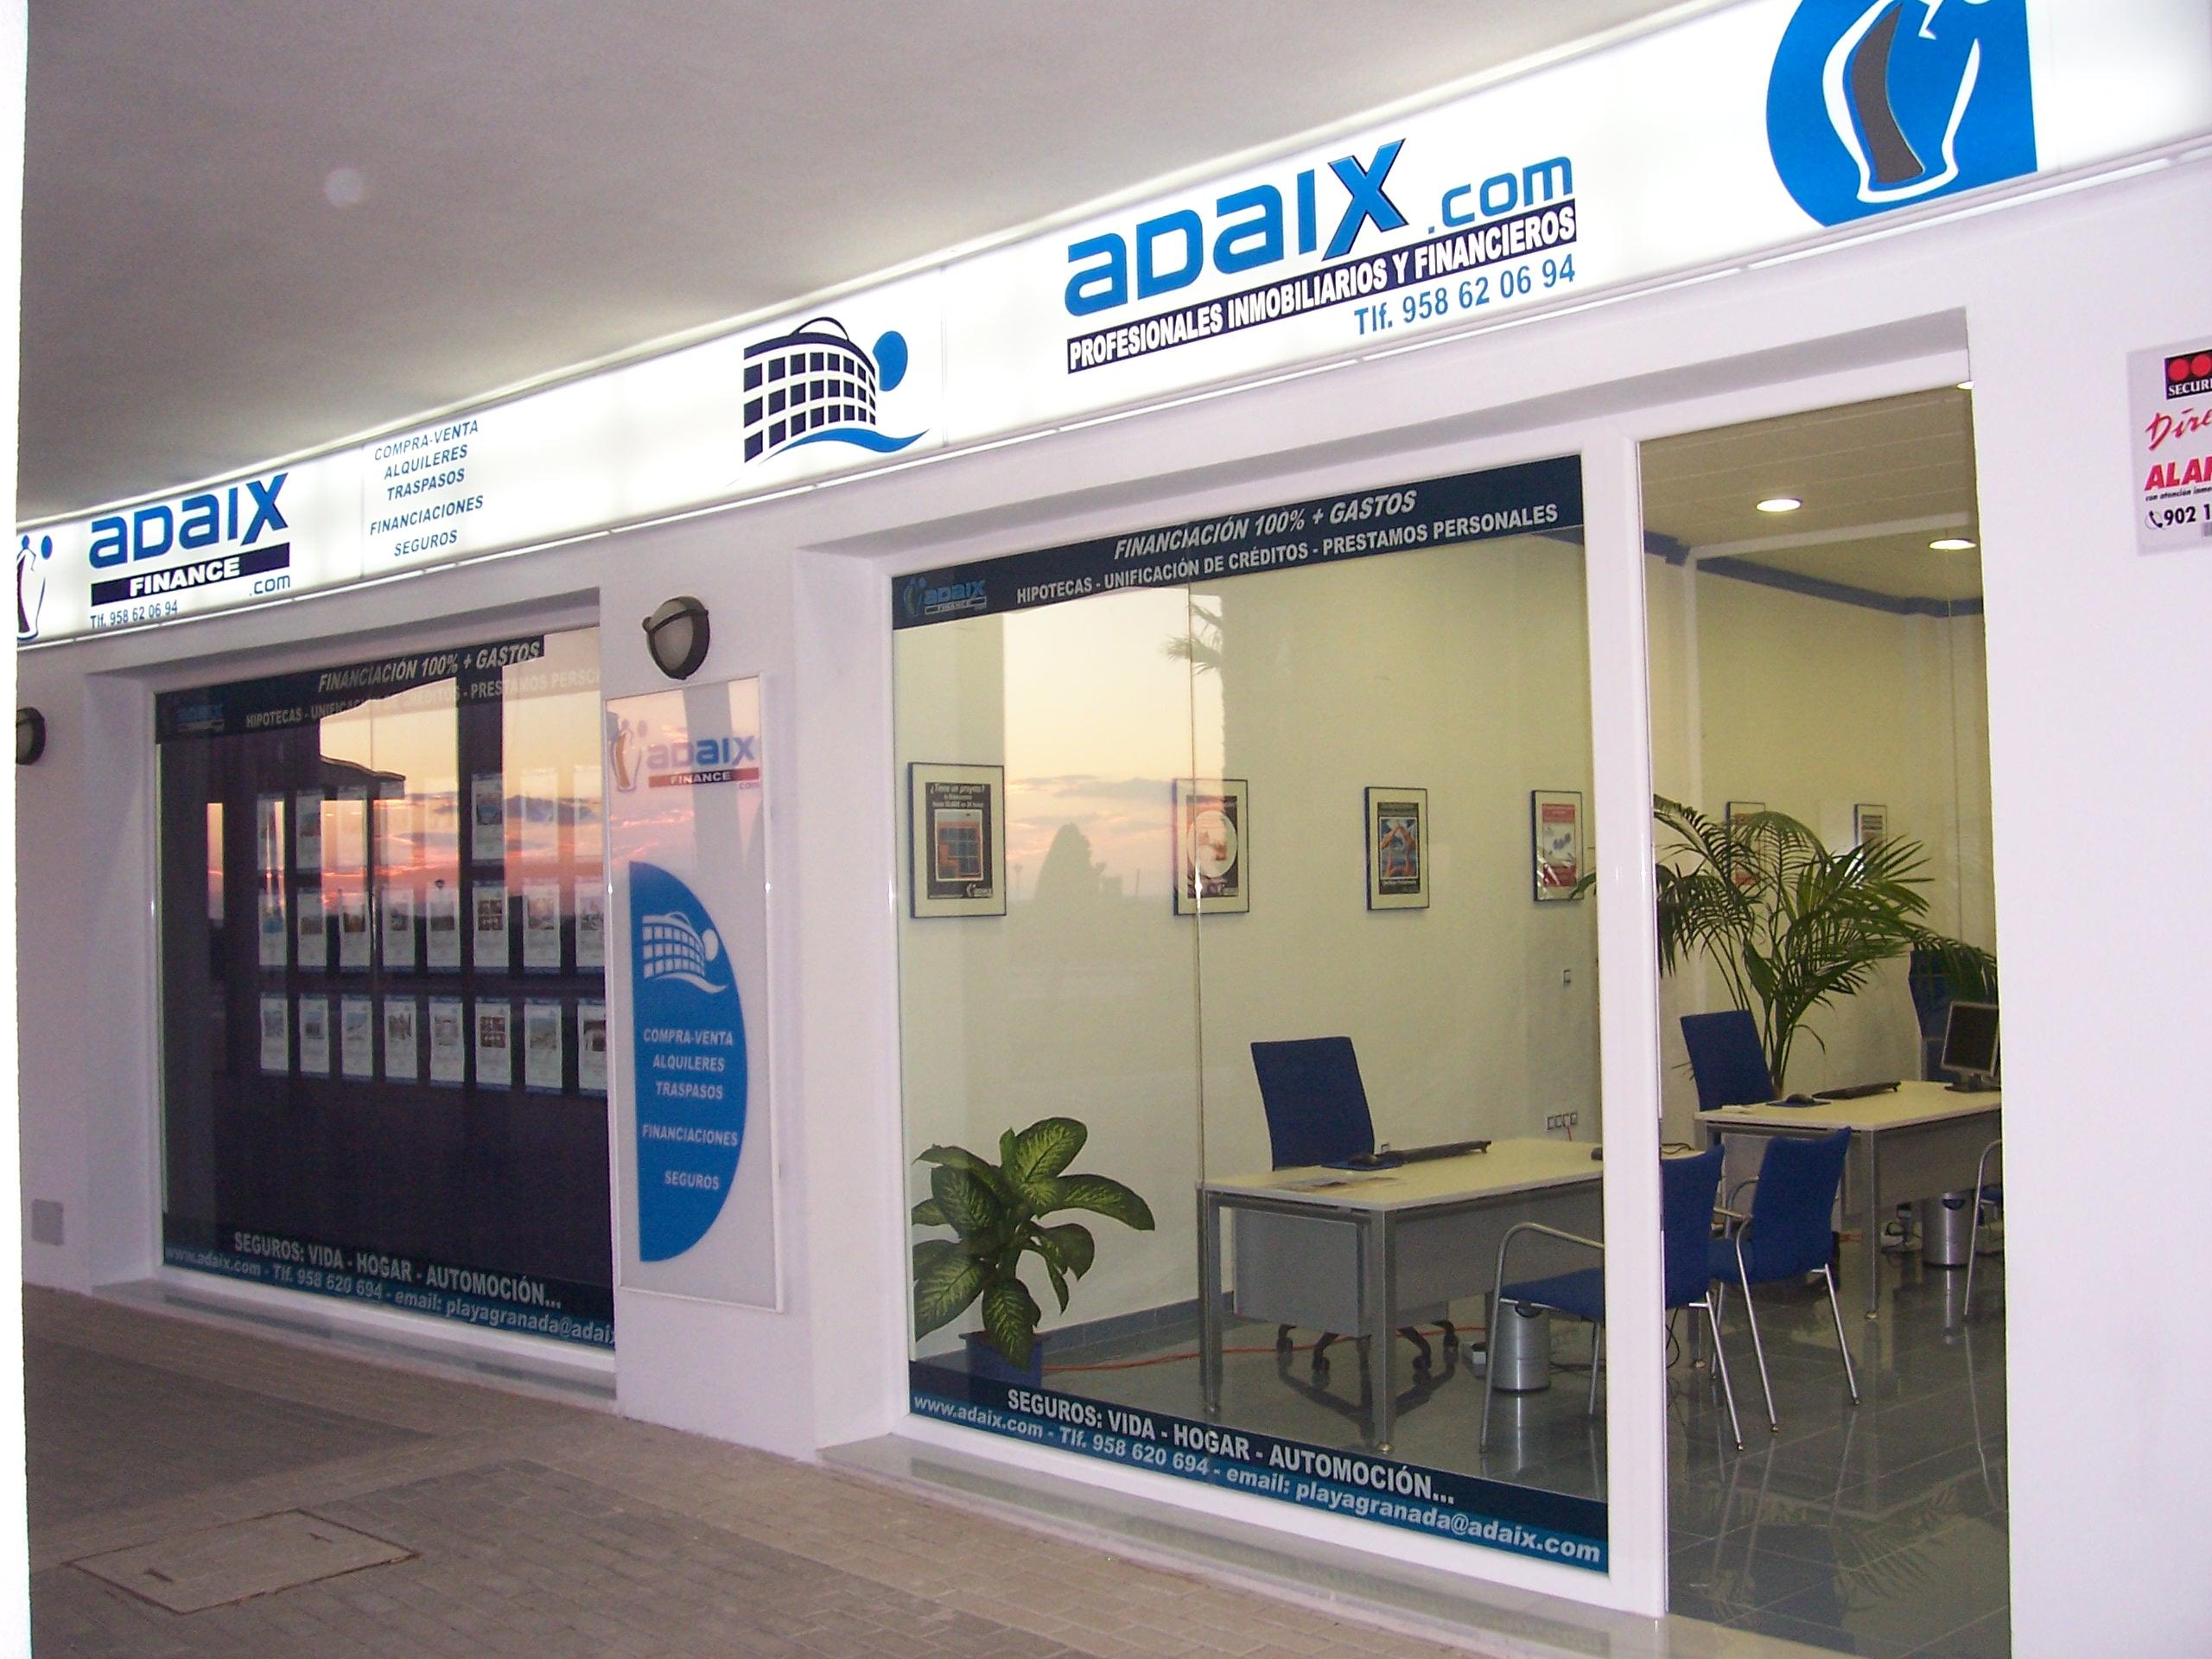 Adaix Playa Granada 2